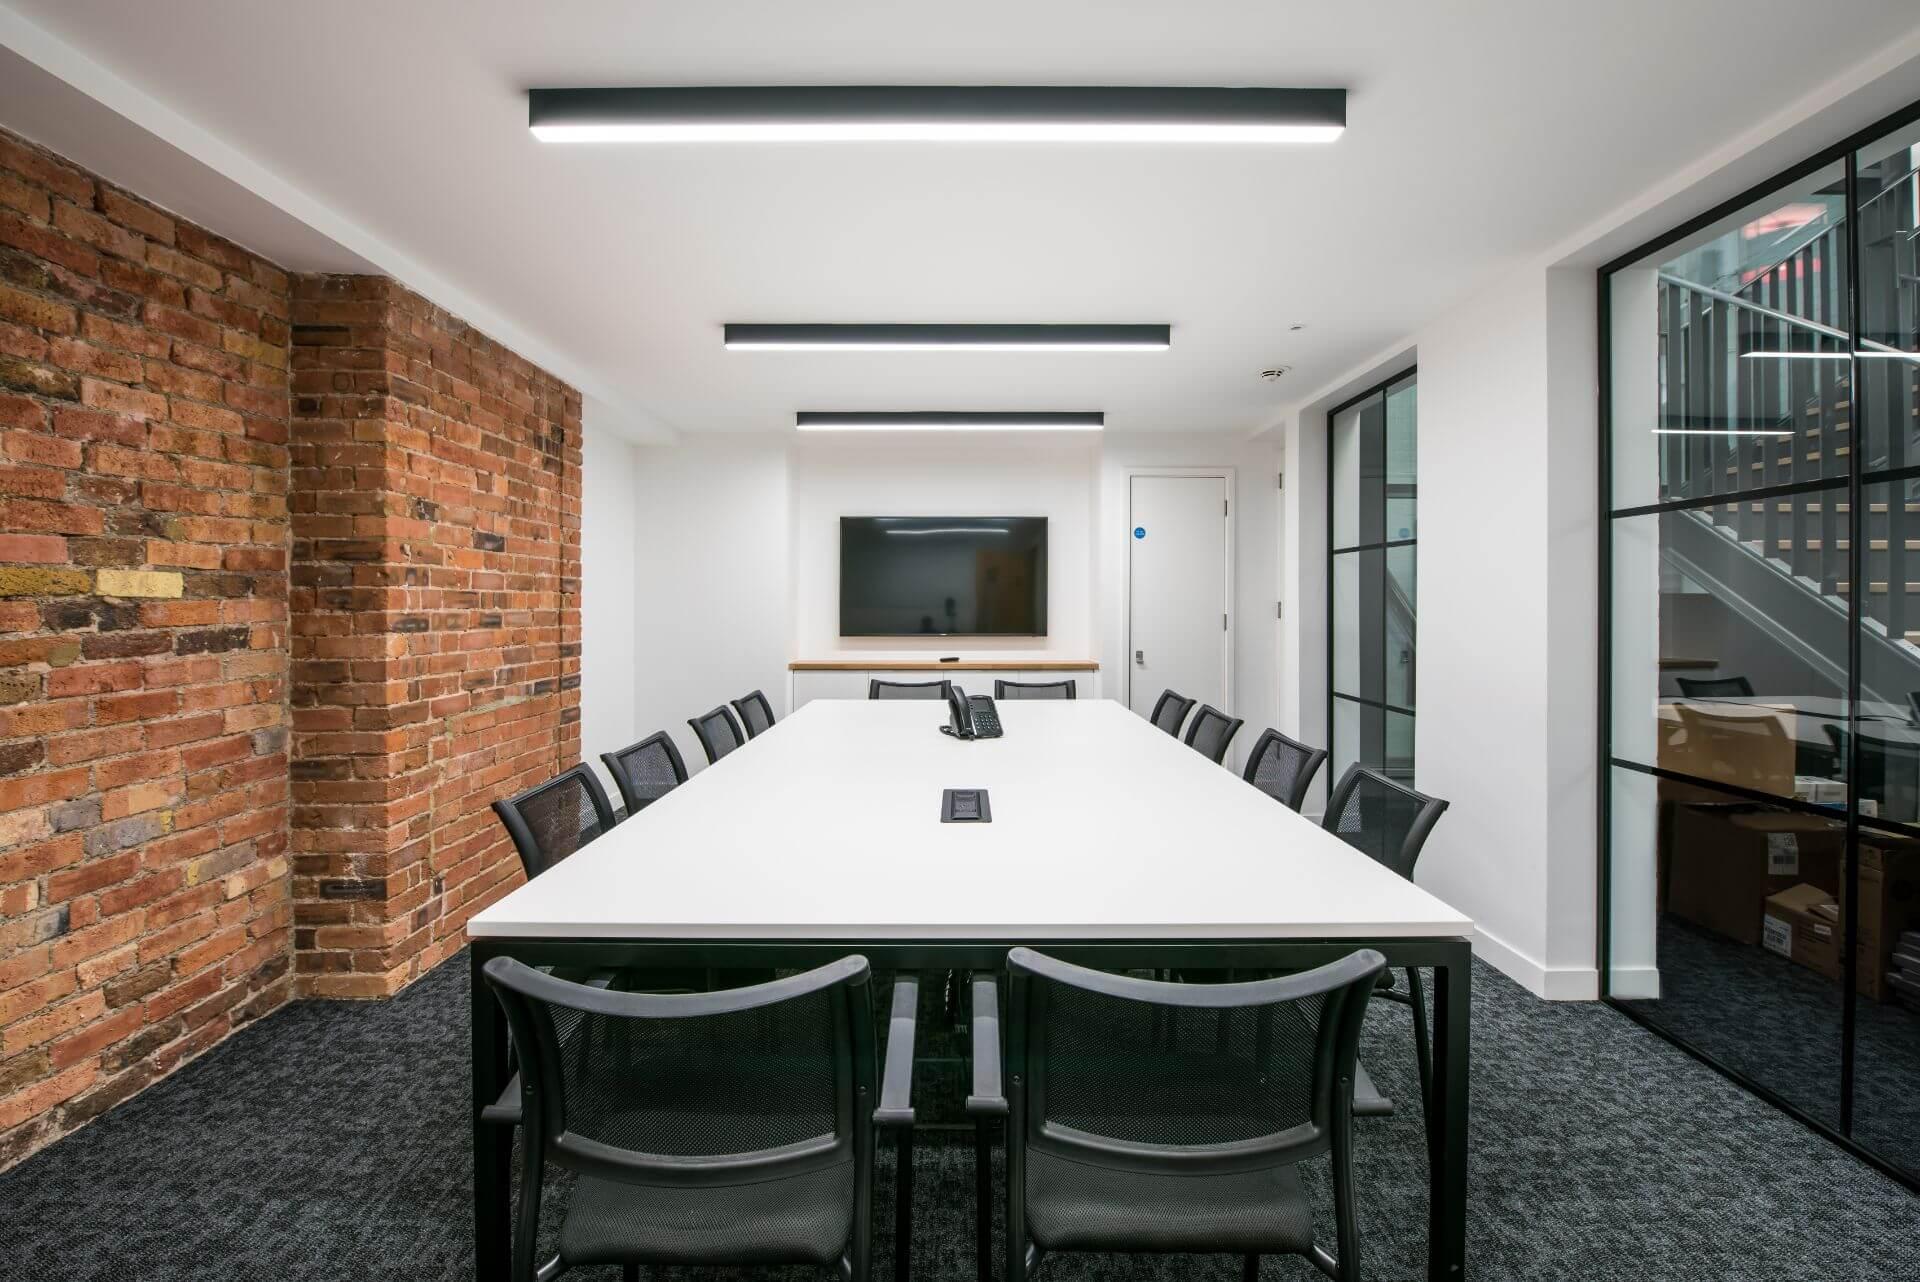 Affinity Workforce Conference Room